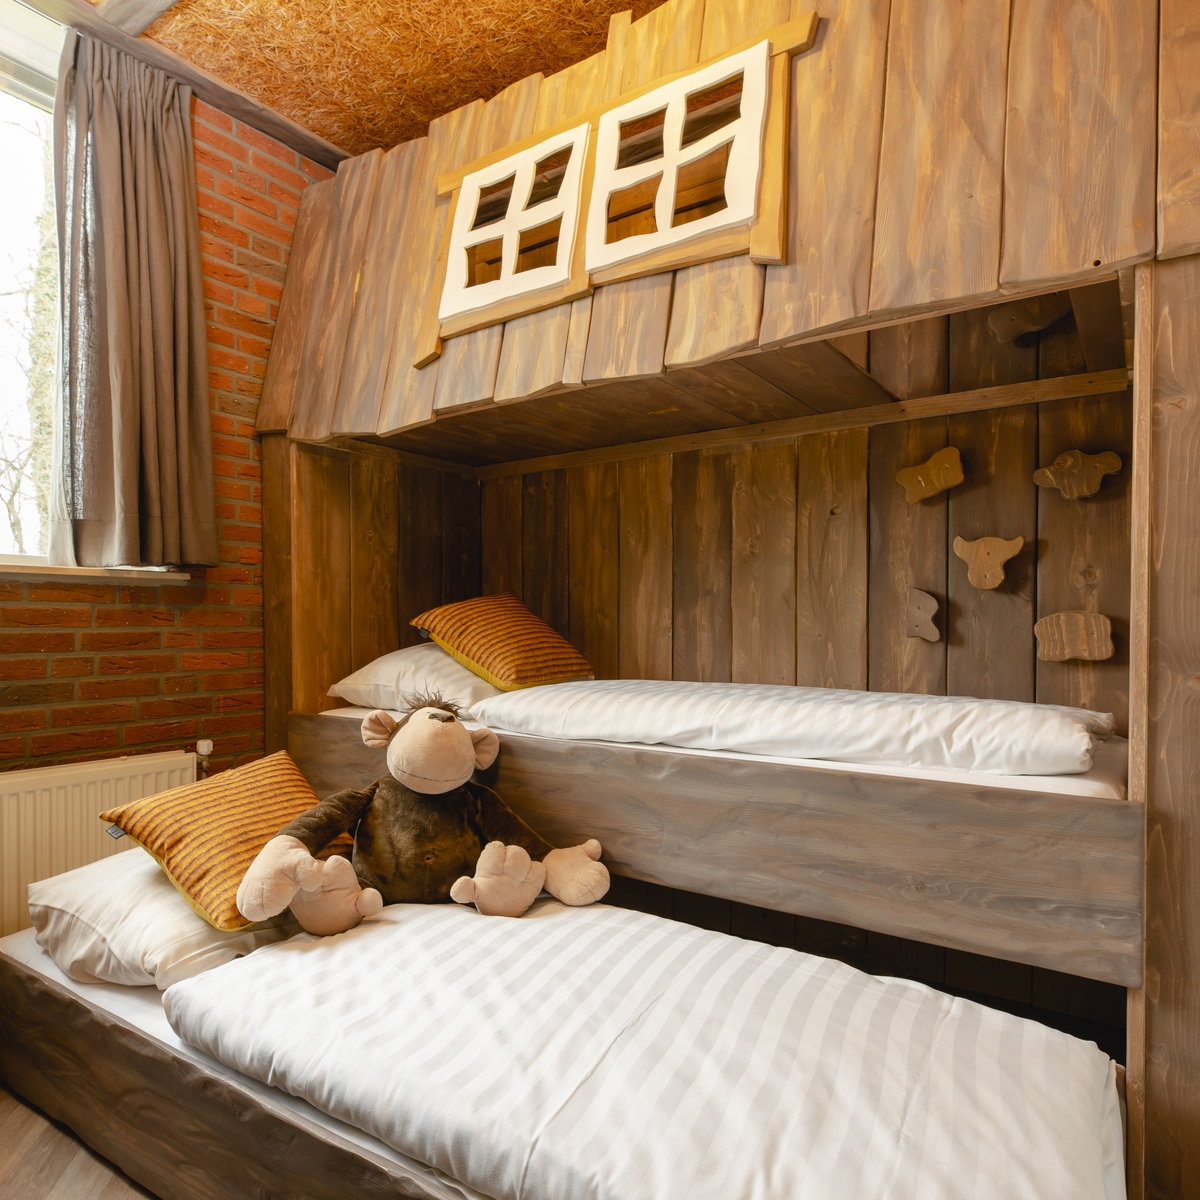 6-persons children's bungalow farm with sauna